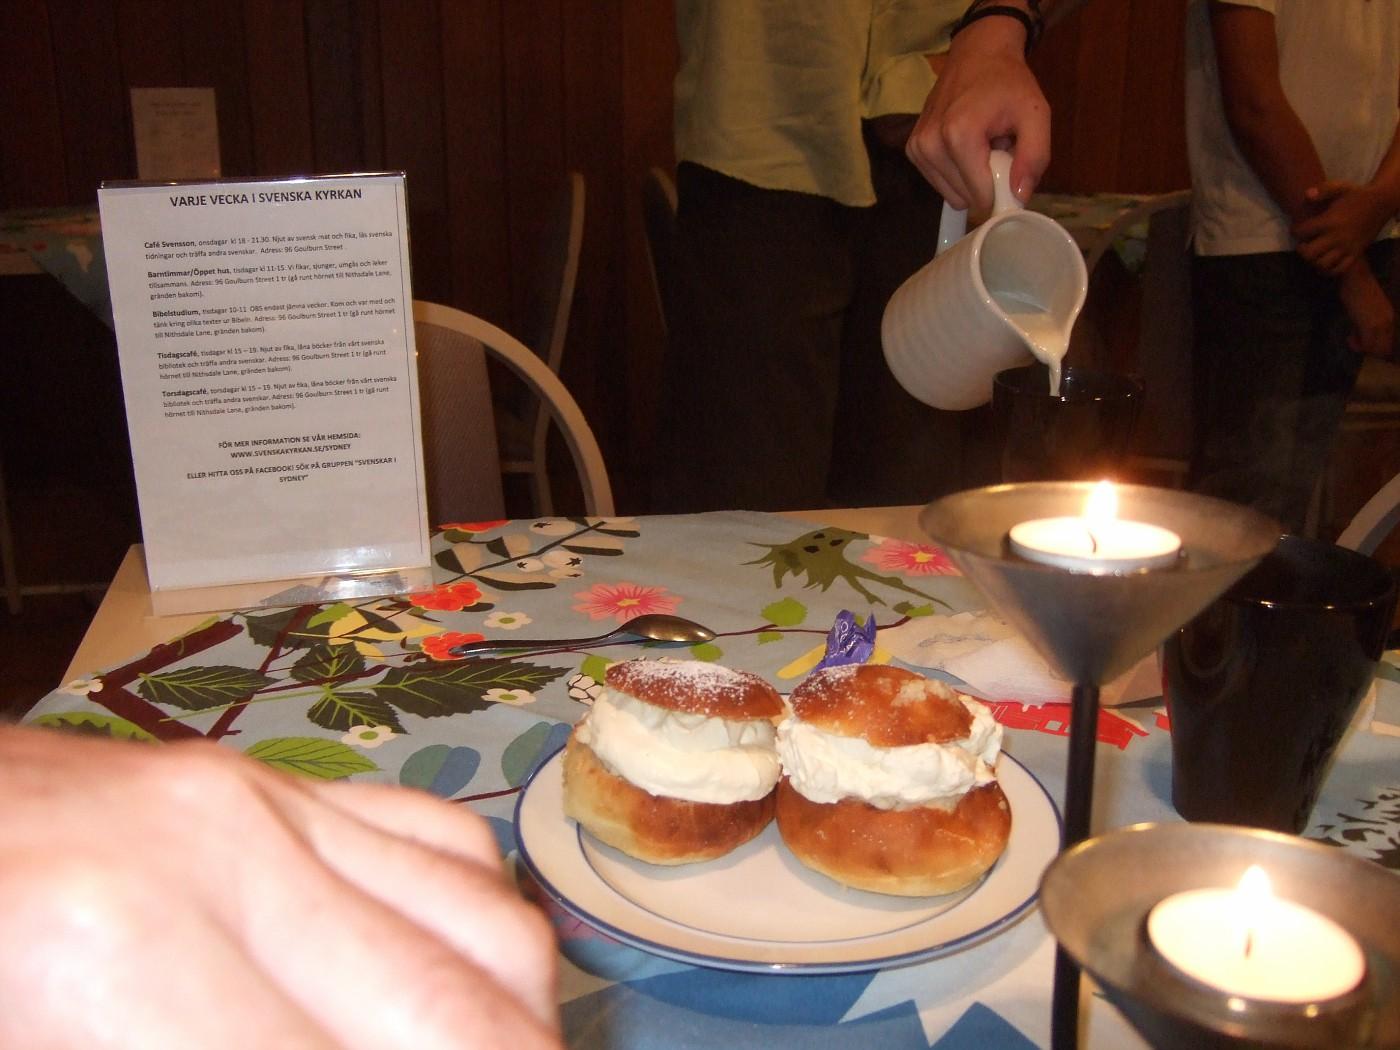 2011 03 09 3 Semlor kväll at Cafe Svensson